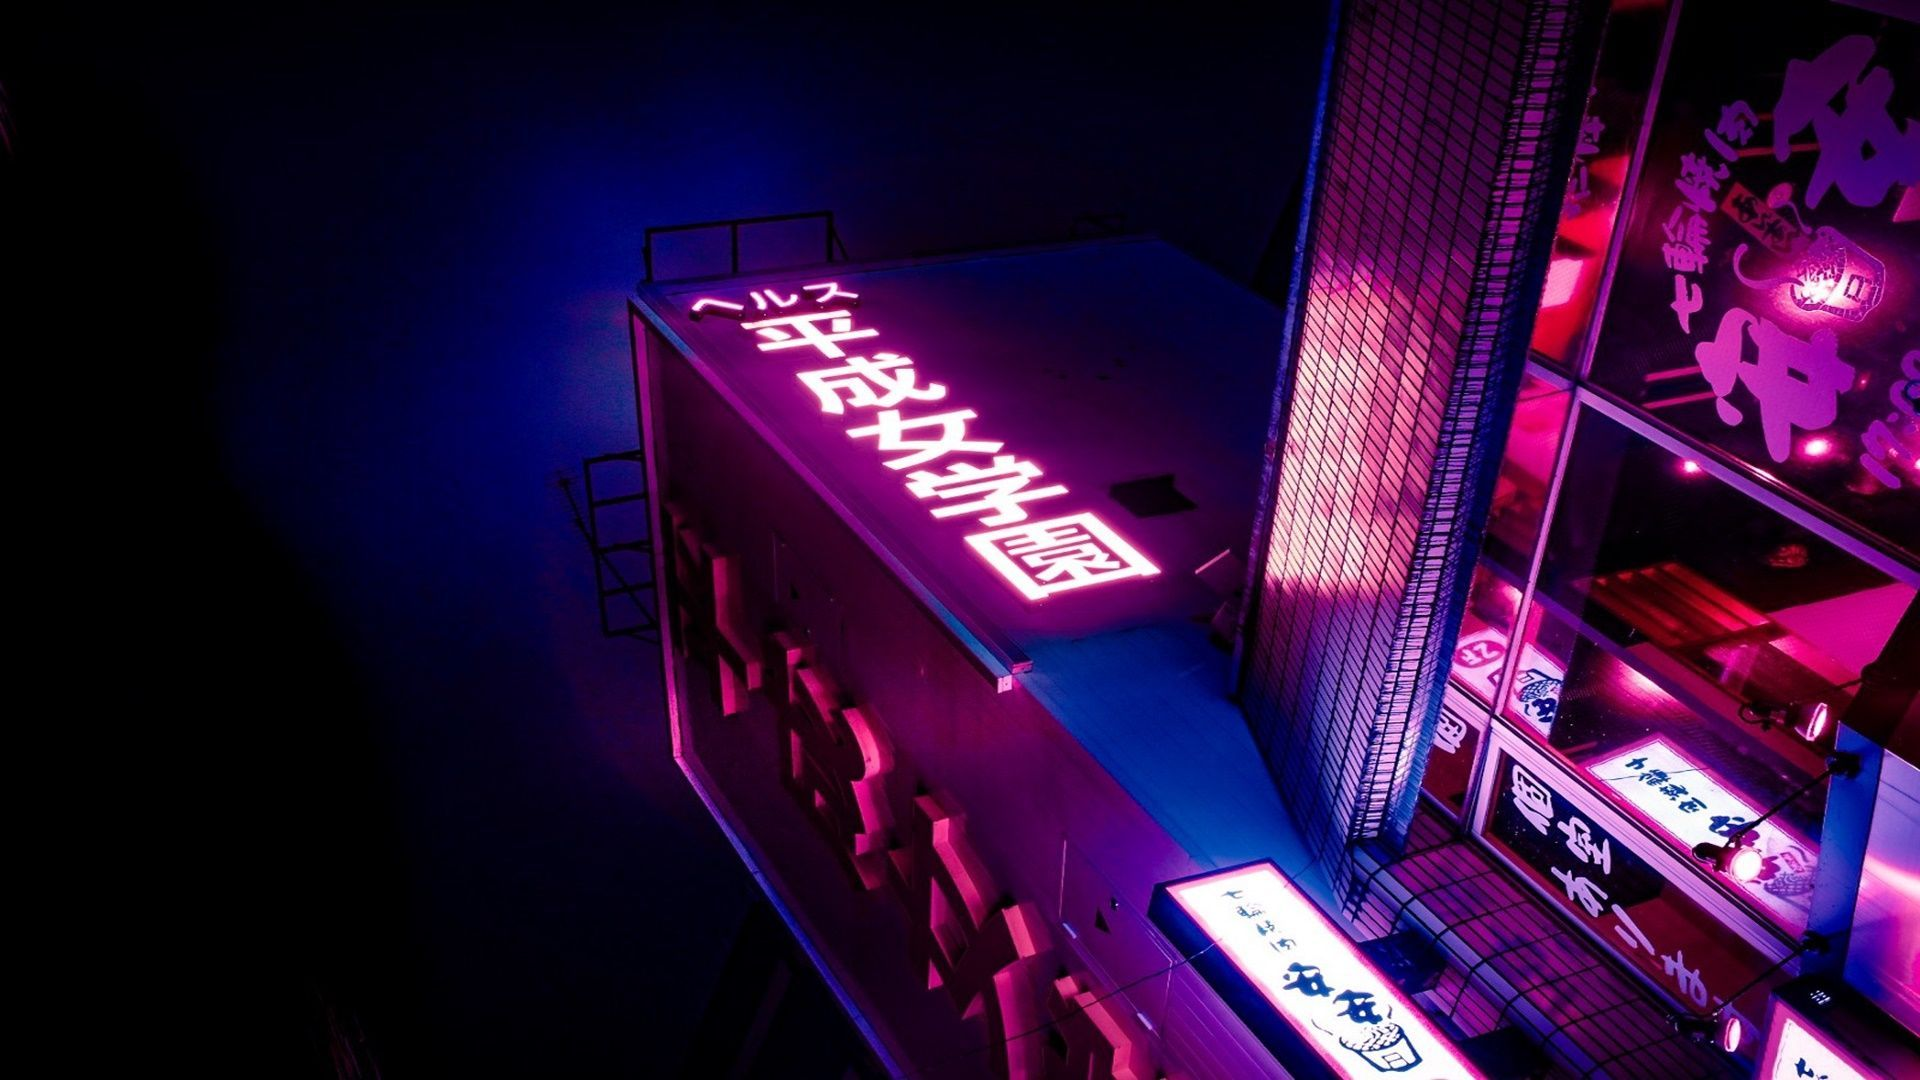 Neon Aesthetic Laptop Wallpapers Wallpaper Cave